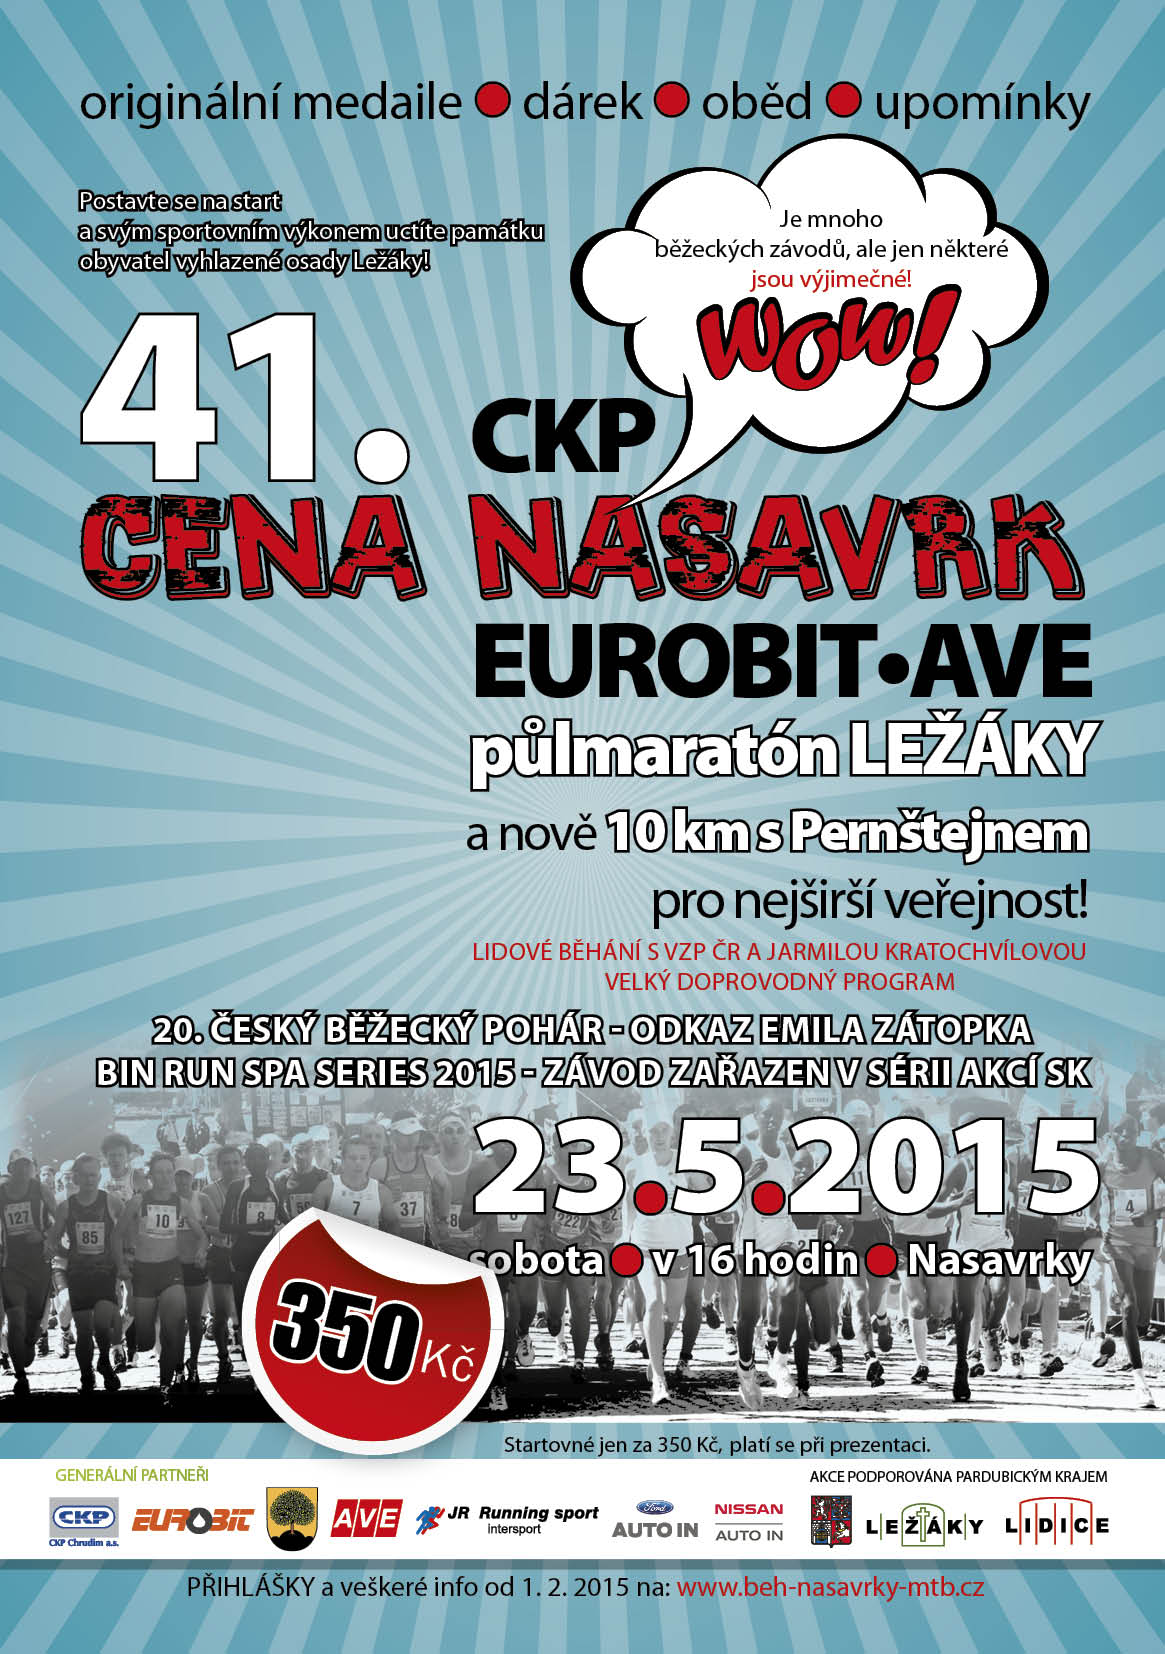 Cena Nasavrk – Eurobit AVE půlmaratón Ležáky 2015